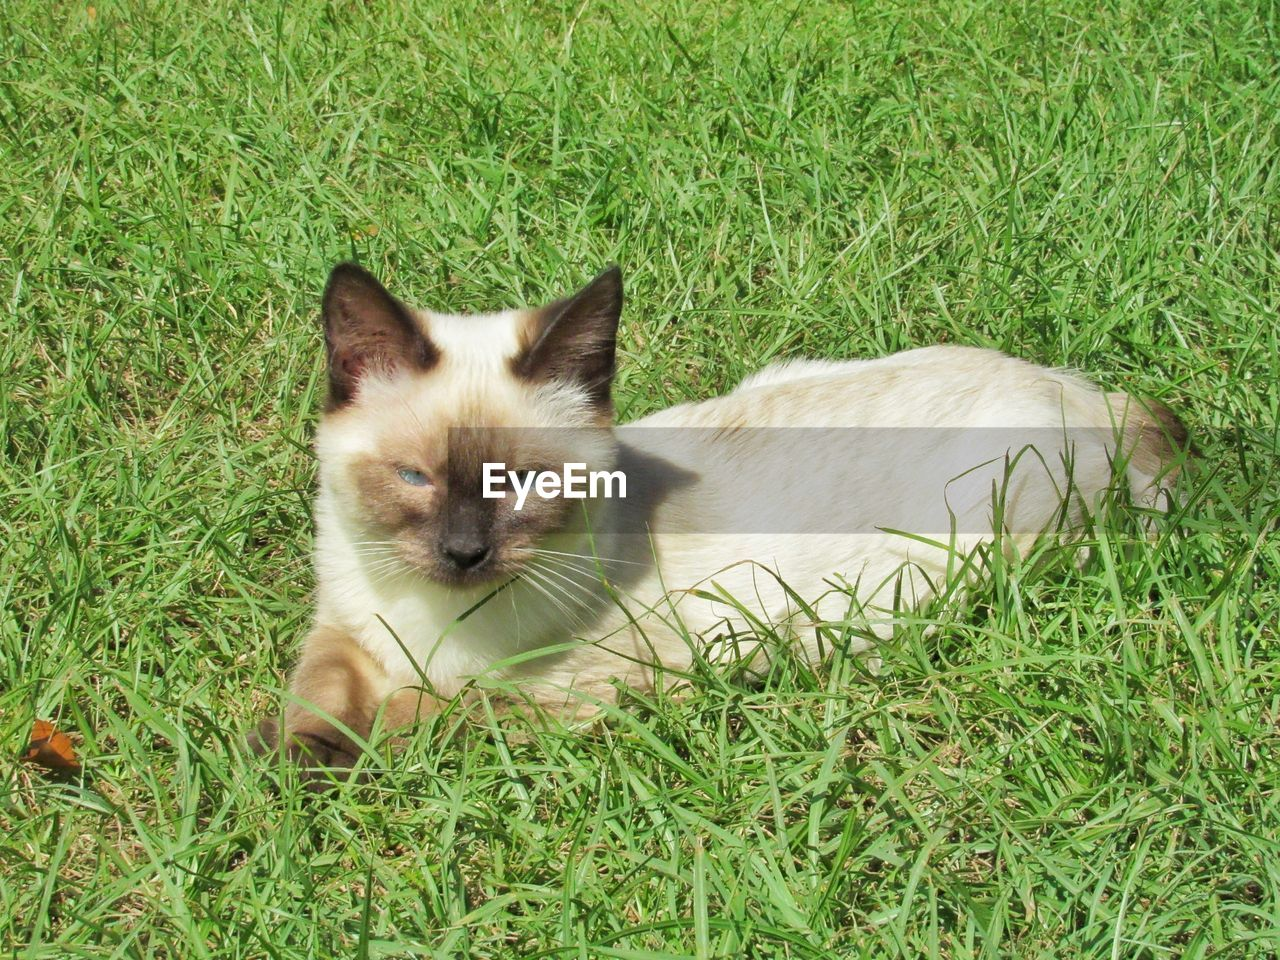 grass, domestic, pets, mammal, domestic animals, one animal, cat, plant, feline, vertebrate, domestic cat, green color, field, land, no people, nature, portrait, whisker